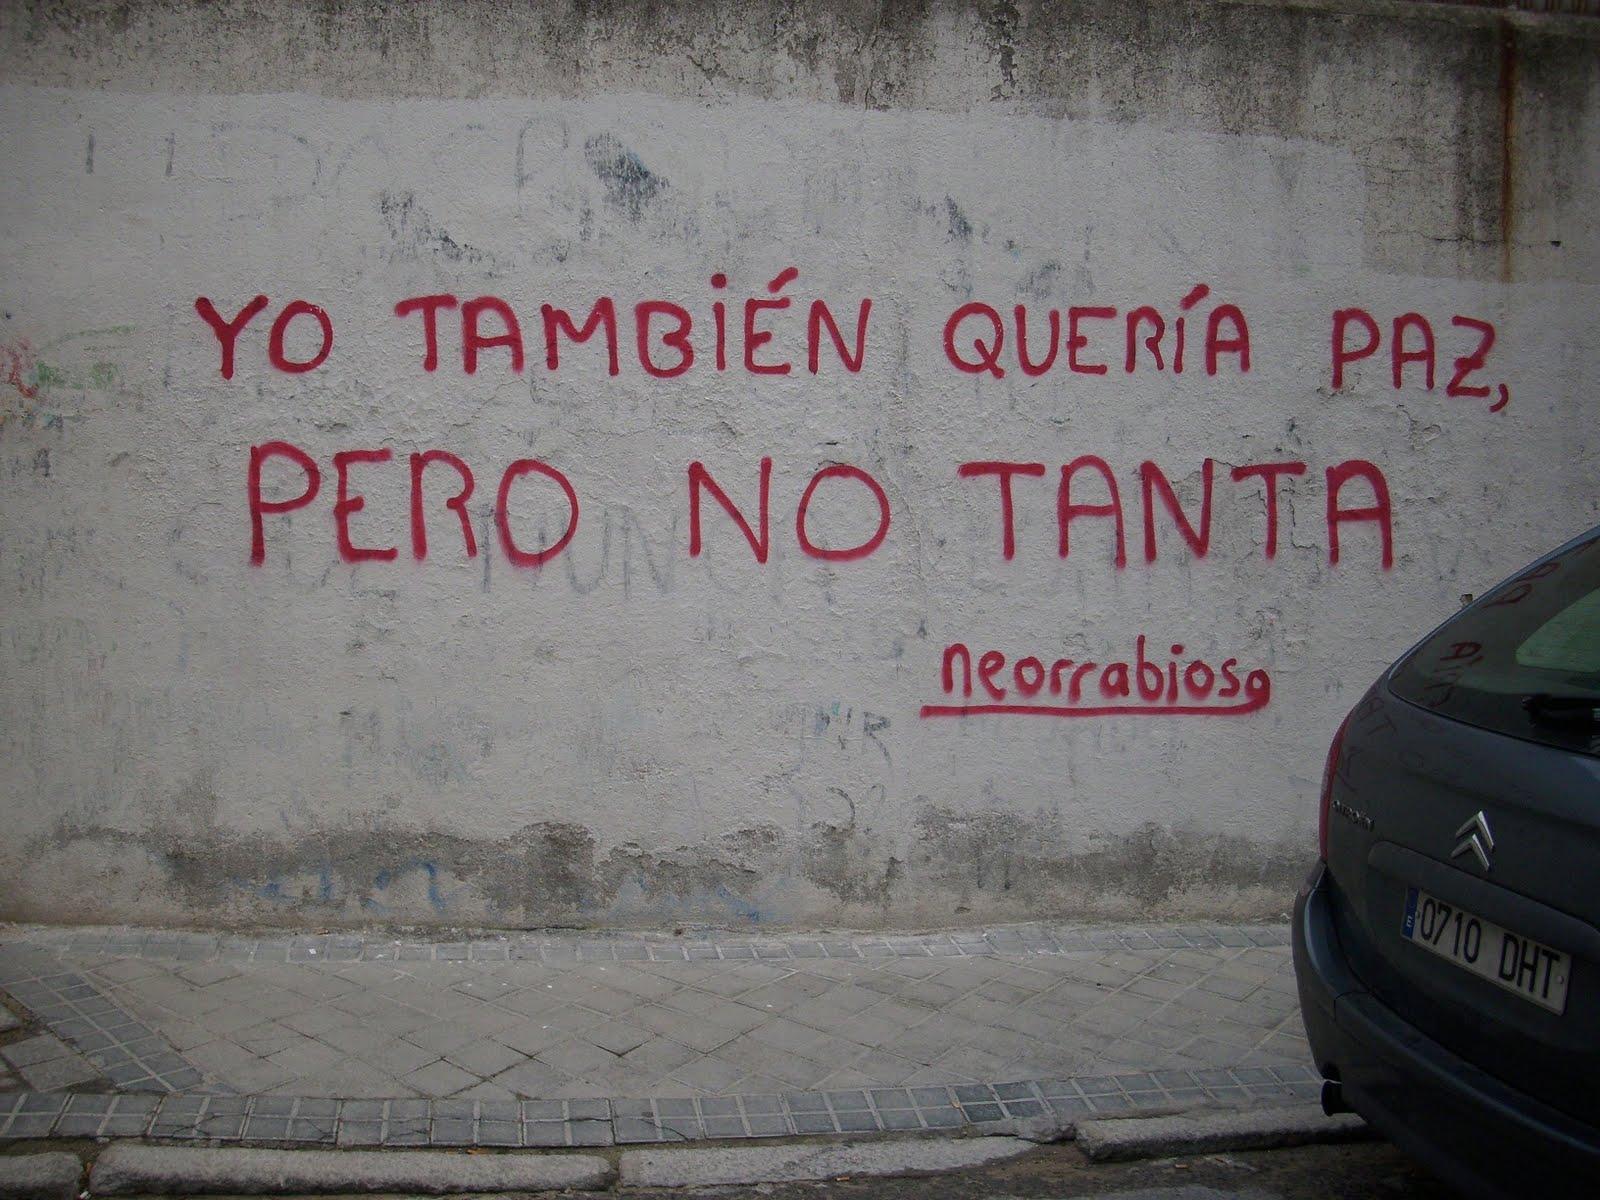 Yo+tambi%C3%A9n+quer%C3%ADa+paz,+pero+no+tanta4 - Tumblr Frasi in Spagnolo